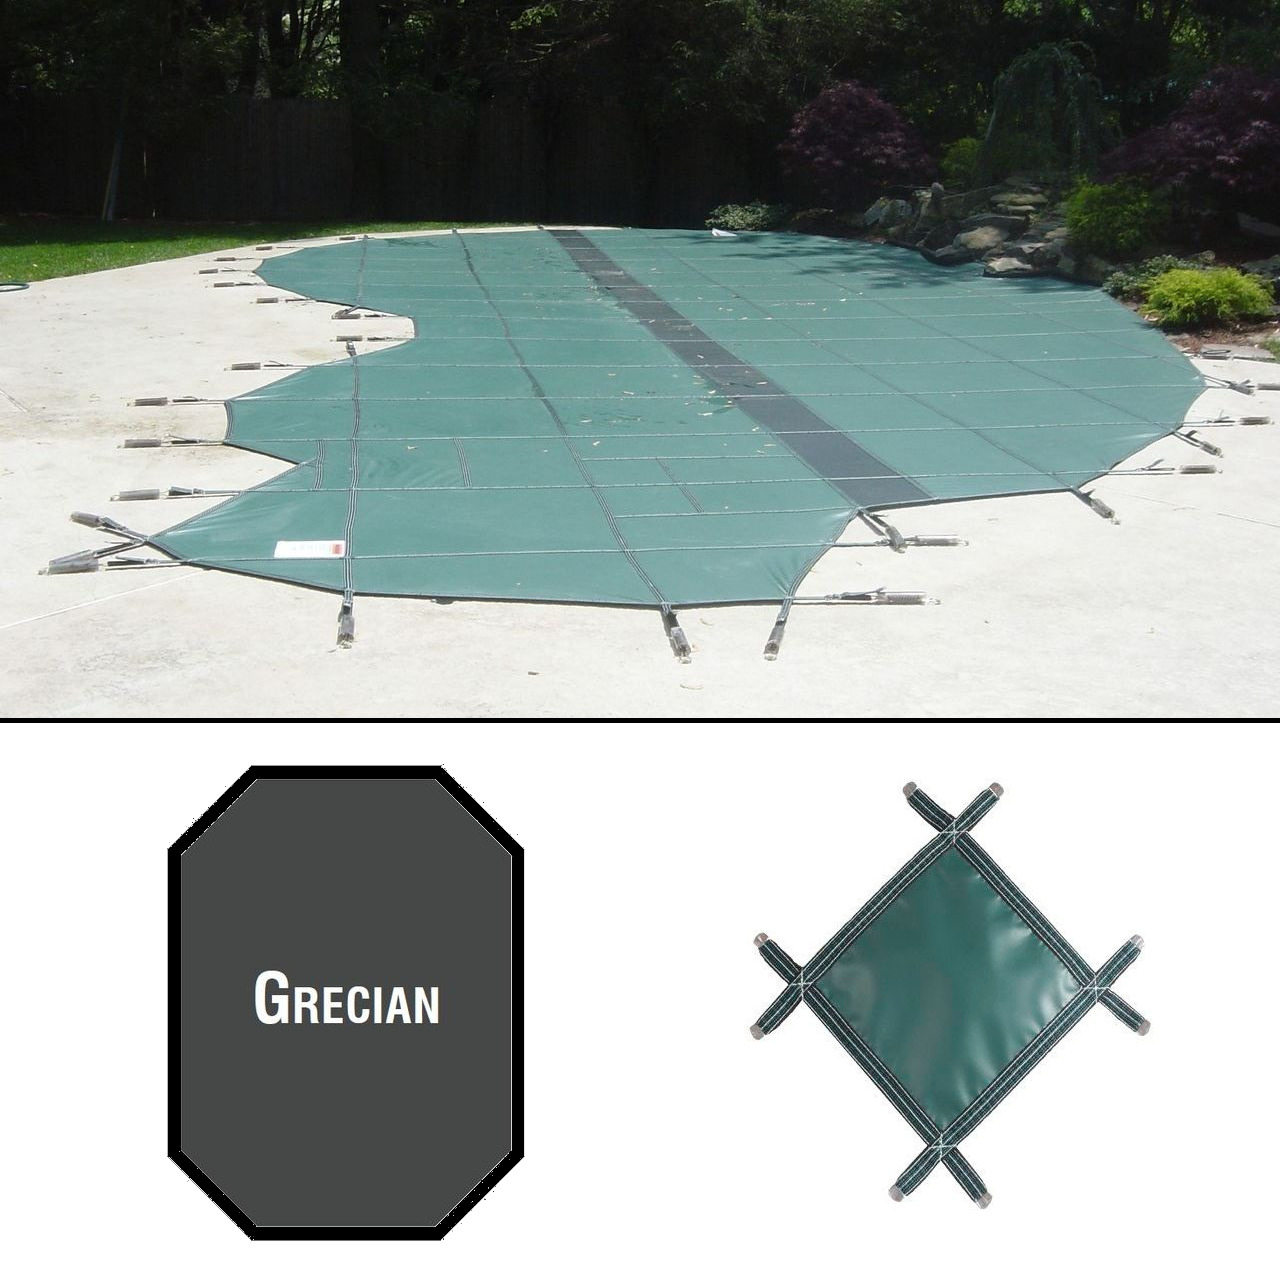 PermaGuard 23'x42' Grecian Pool Cover